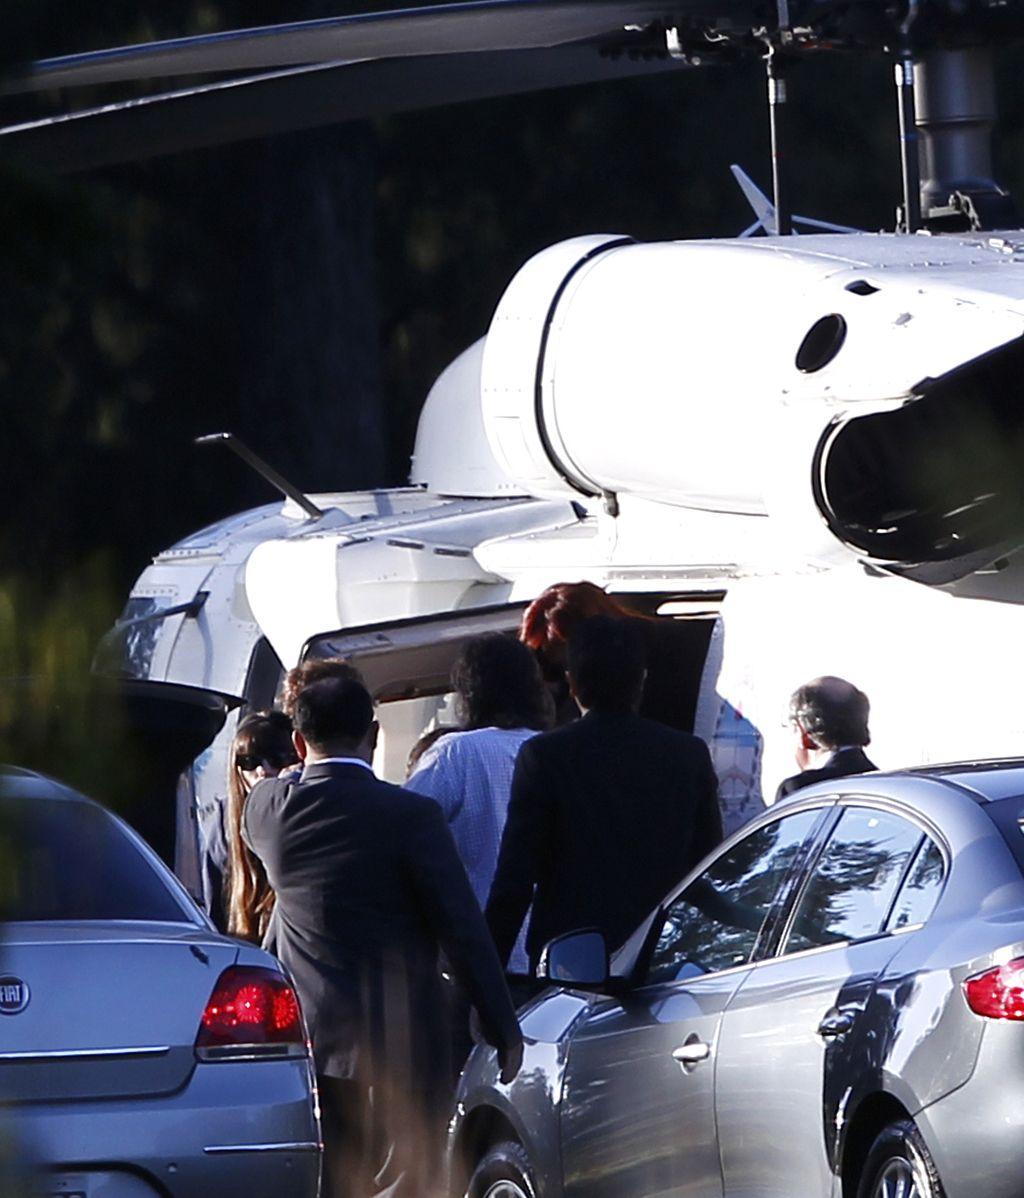 La presidenta argentina, Cristina Fernández, baja del helicóptero que trasladó a la mandataria al Hospital Austral para ser operada de un cáncer de tiroides